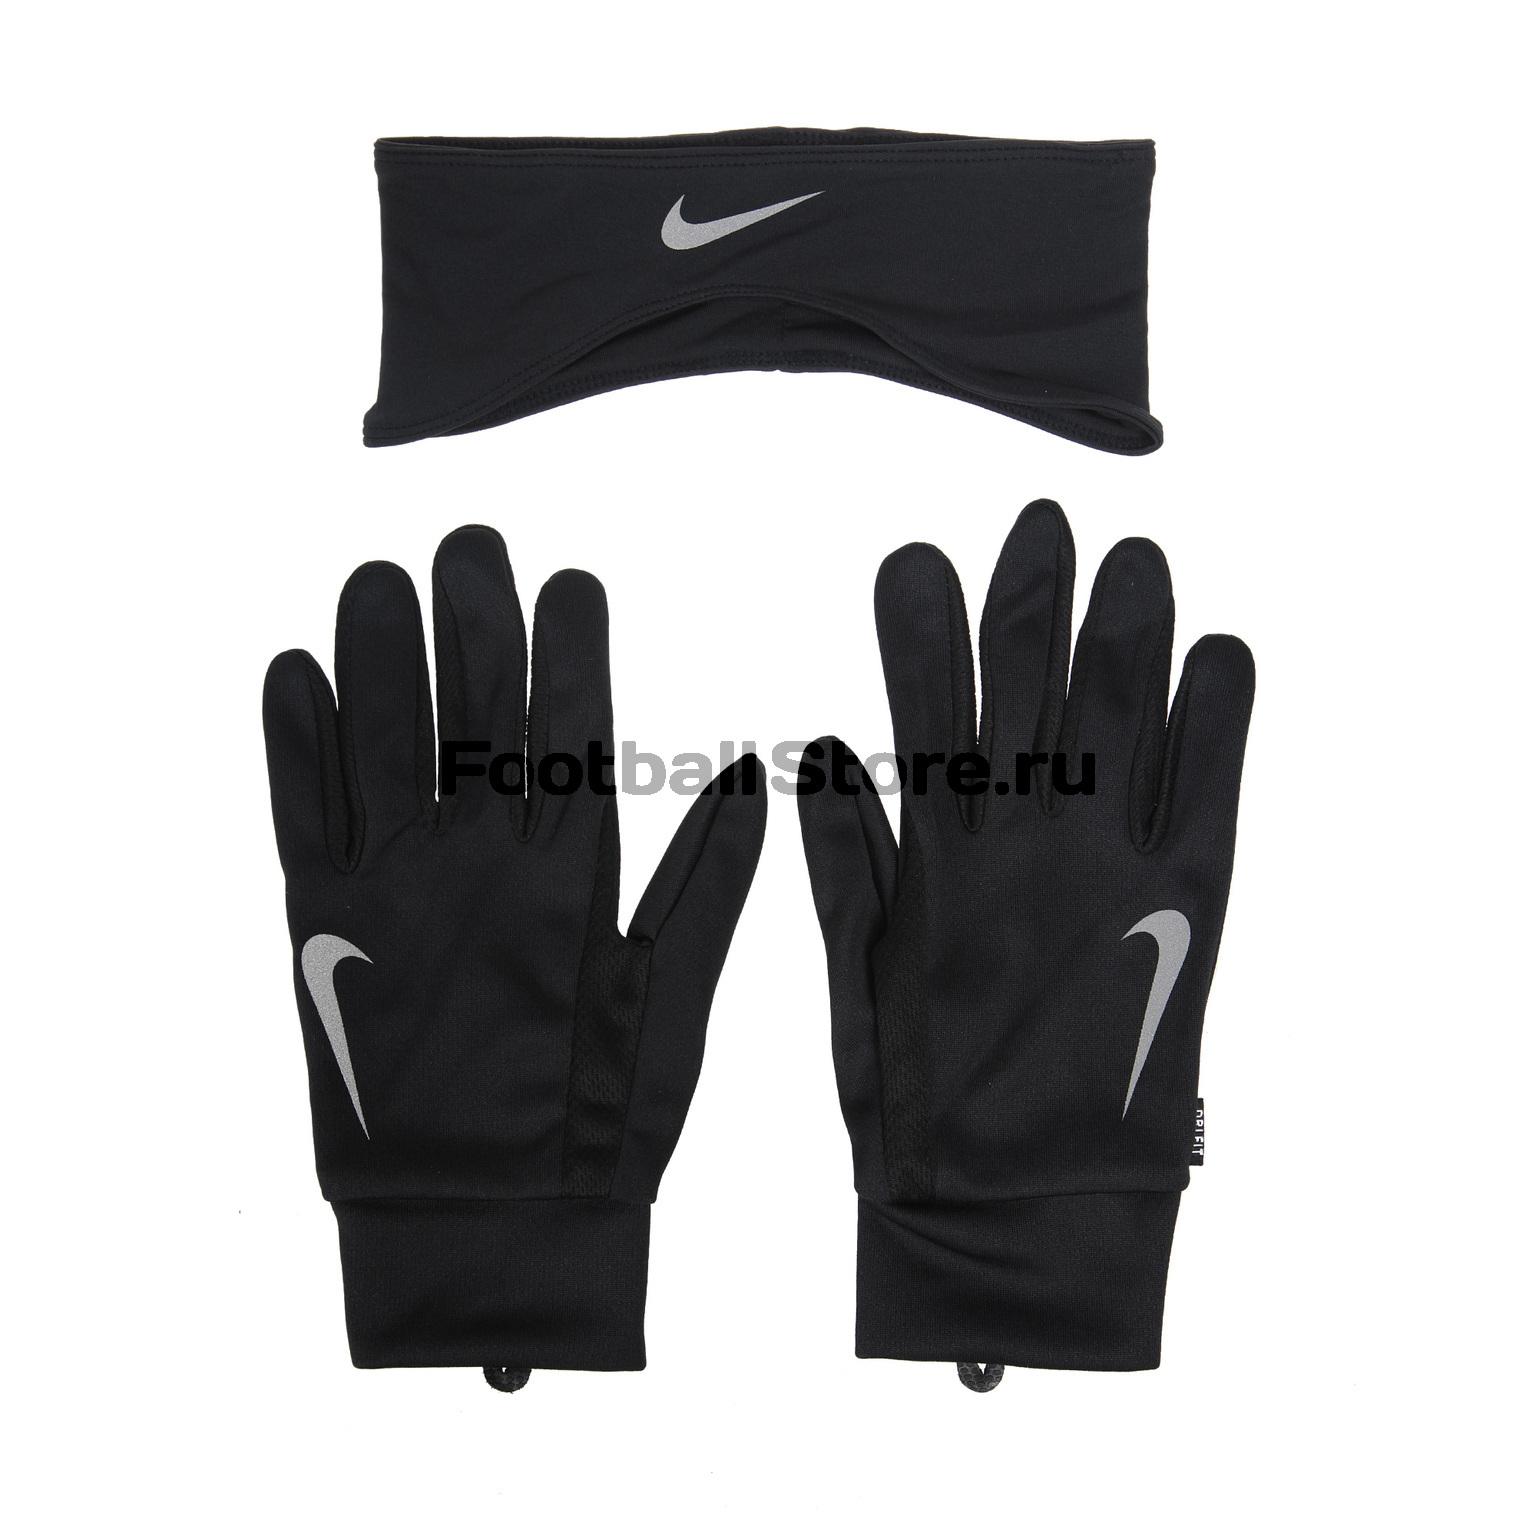 Набор для бега (мужской) Nike Dry Fit N.RC.02.001.LG свитшот мужской nike nike цвет голубой